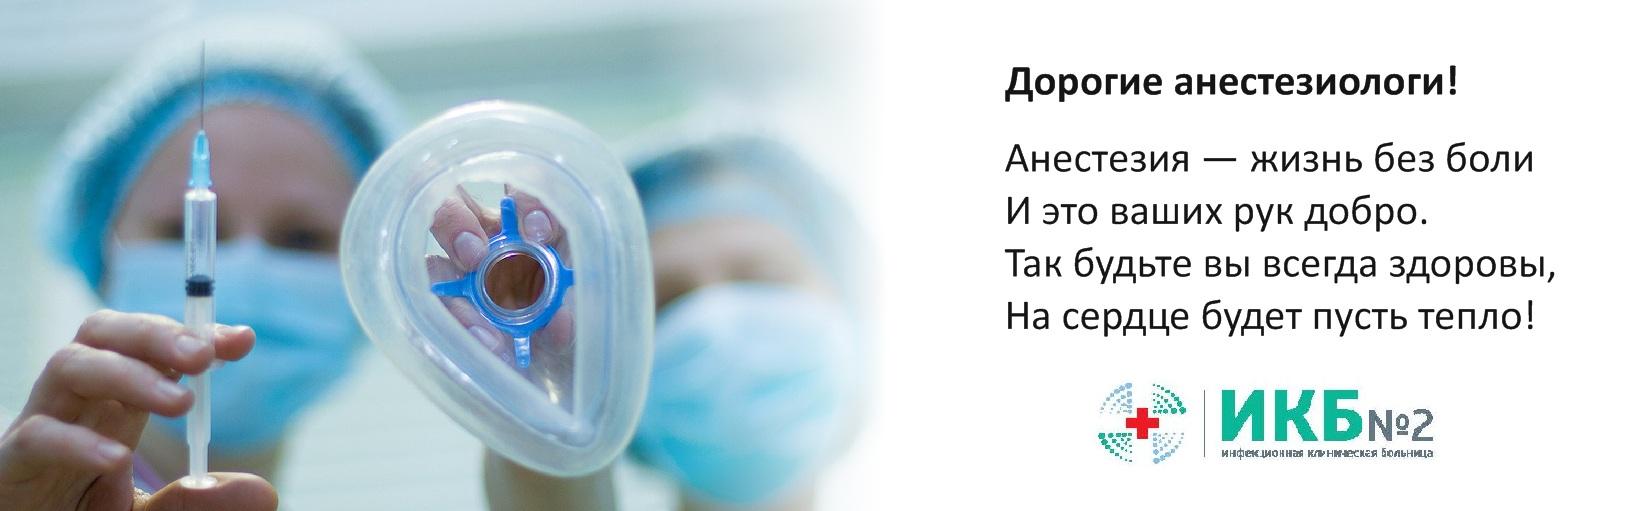 Лет, открытки с днем анестезиолога